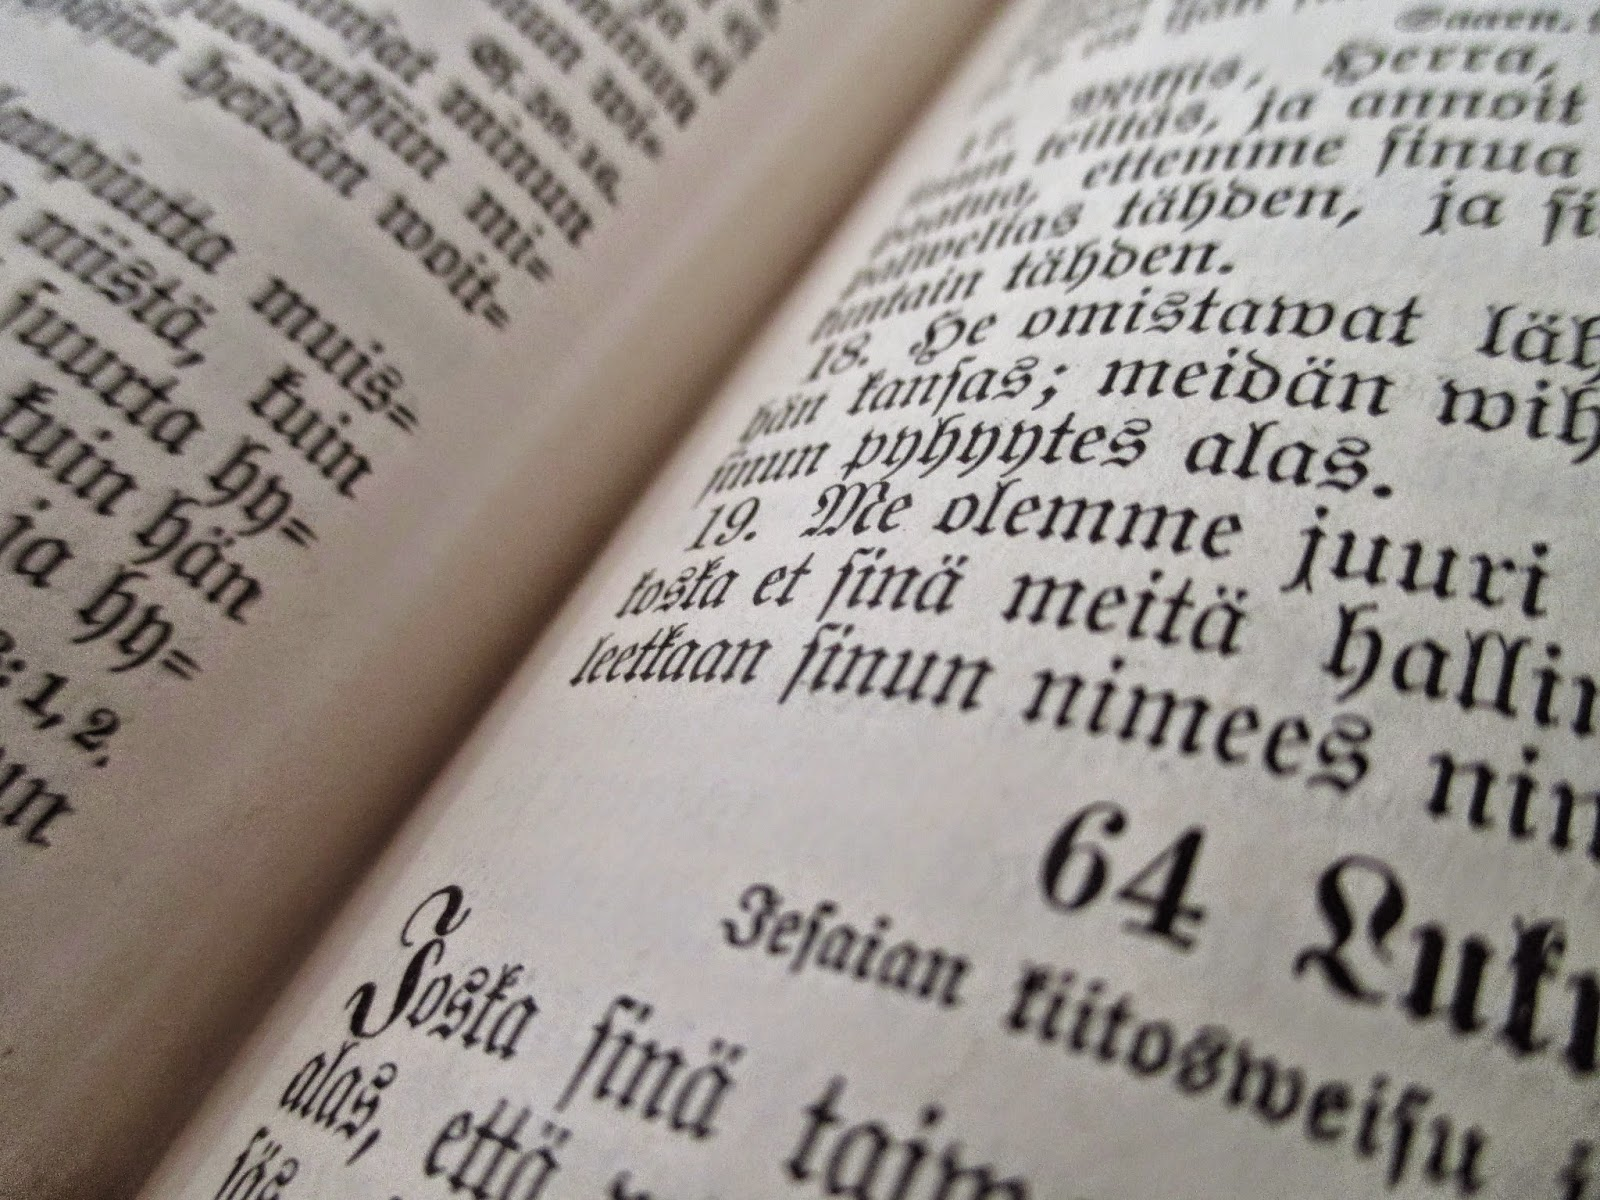 Biblia, teksti, fraktuura, vanha kirja